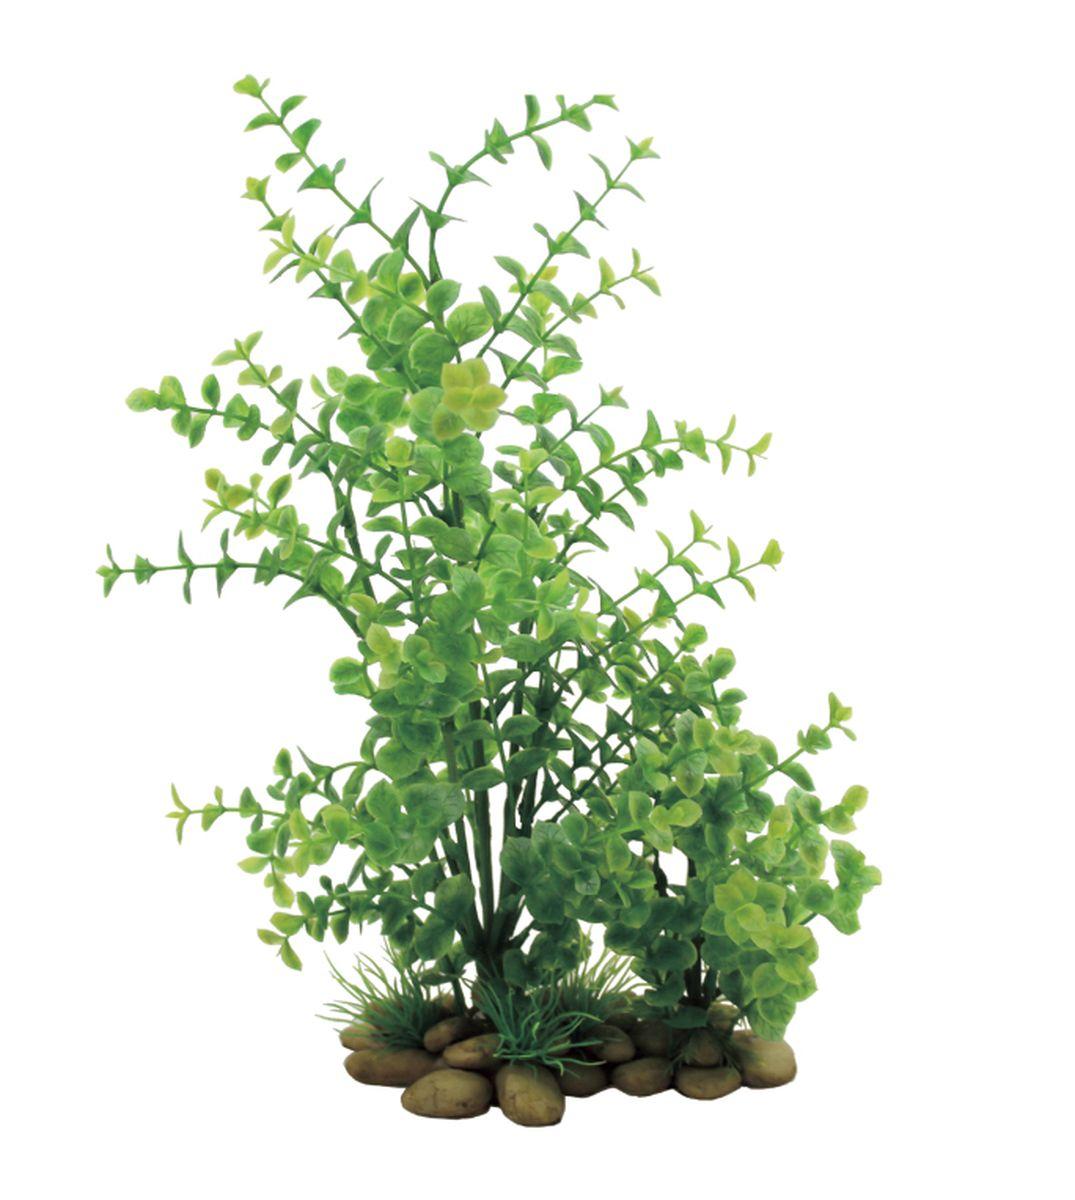 Растение для аквариума ArtUniq Лизимахия, высота 38 смART-1150103Растение для аквариума ArtUniq Лизимахия, высота 38 см